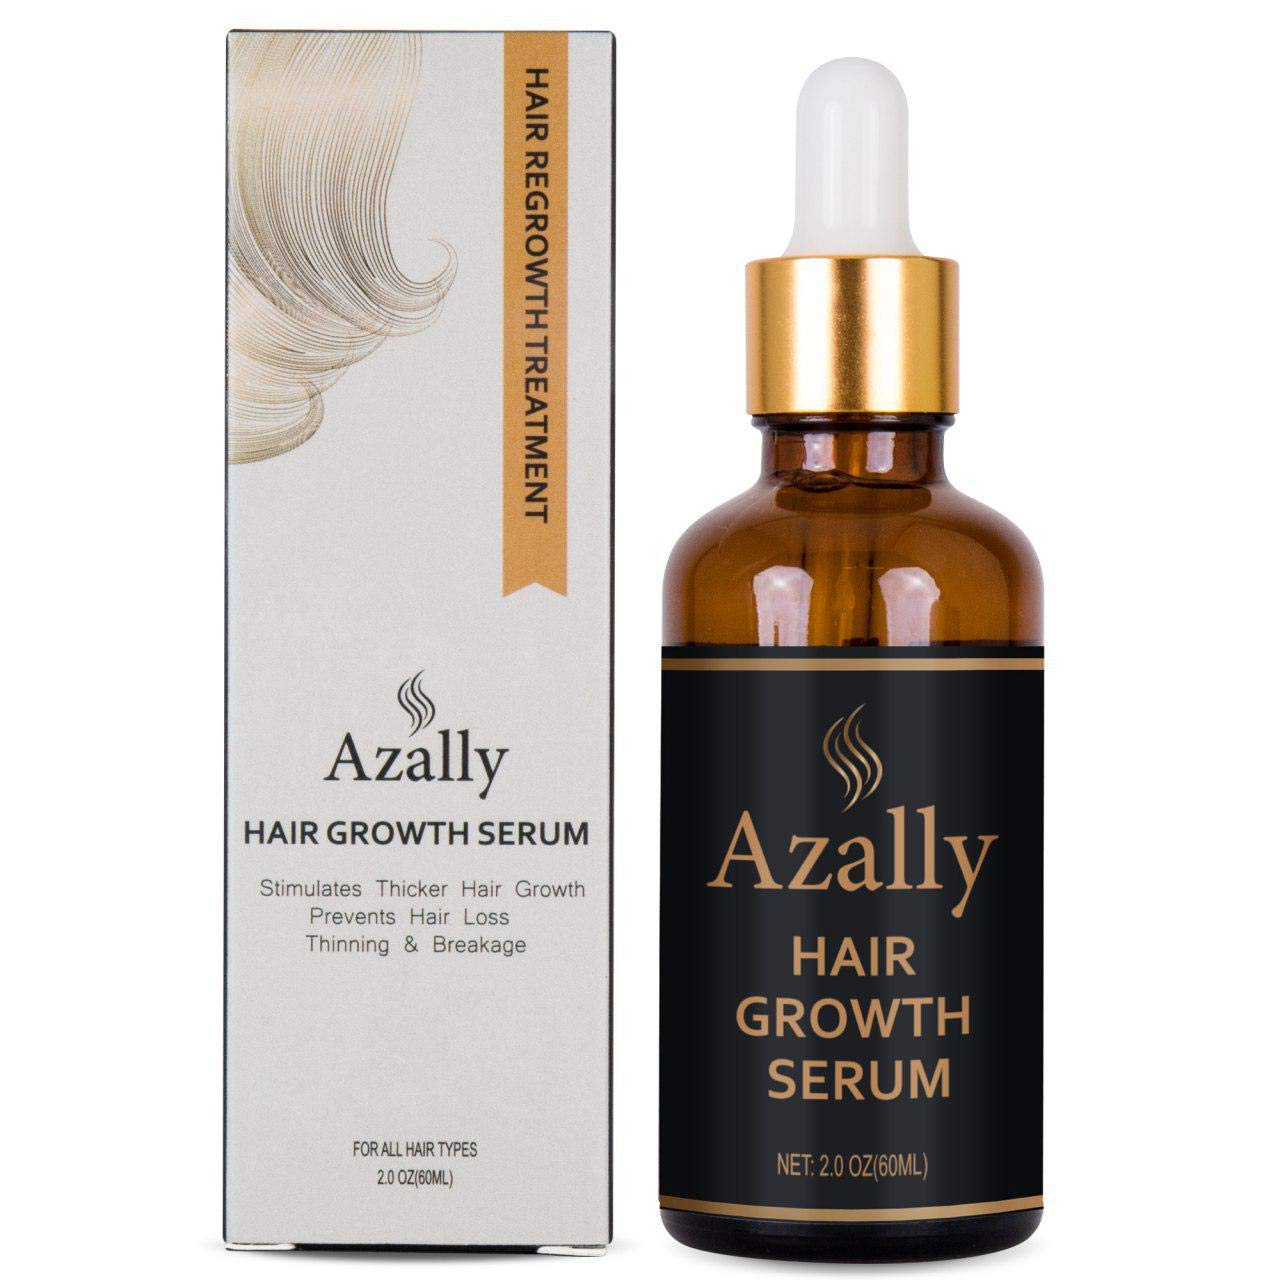 AZALLY Hair Growth Serum, Ginger Hair Growth Oil , Best Hair Loss Prevention Treatment(60ml) by AZALLY